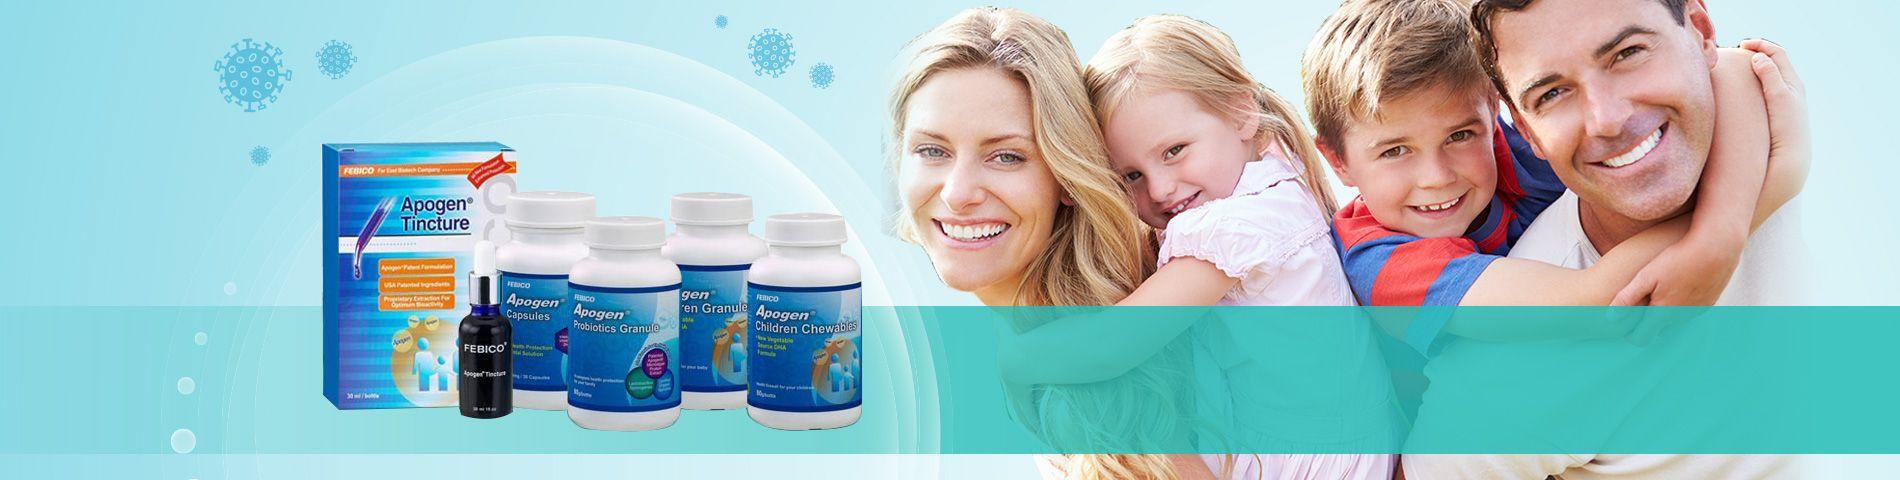 Apogen® ยาต้านไวรัสตามธรรมชาติ อาหารเสริมเสริมภูมิคุ้มกัน